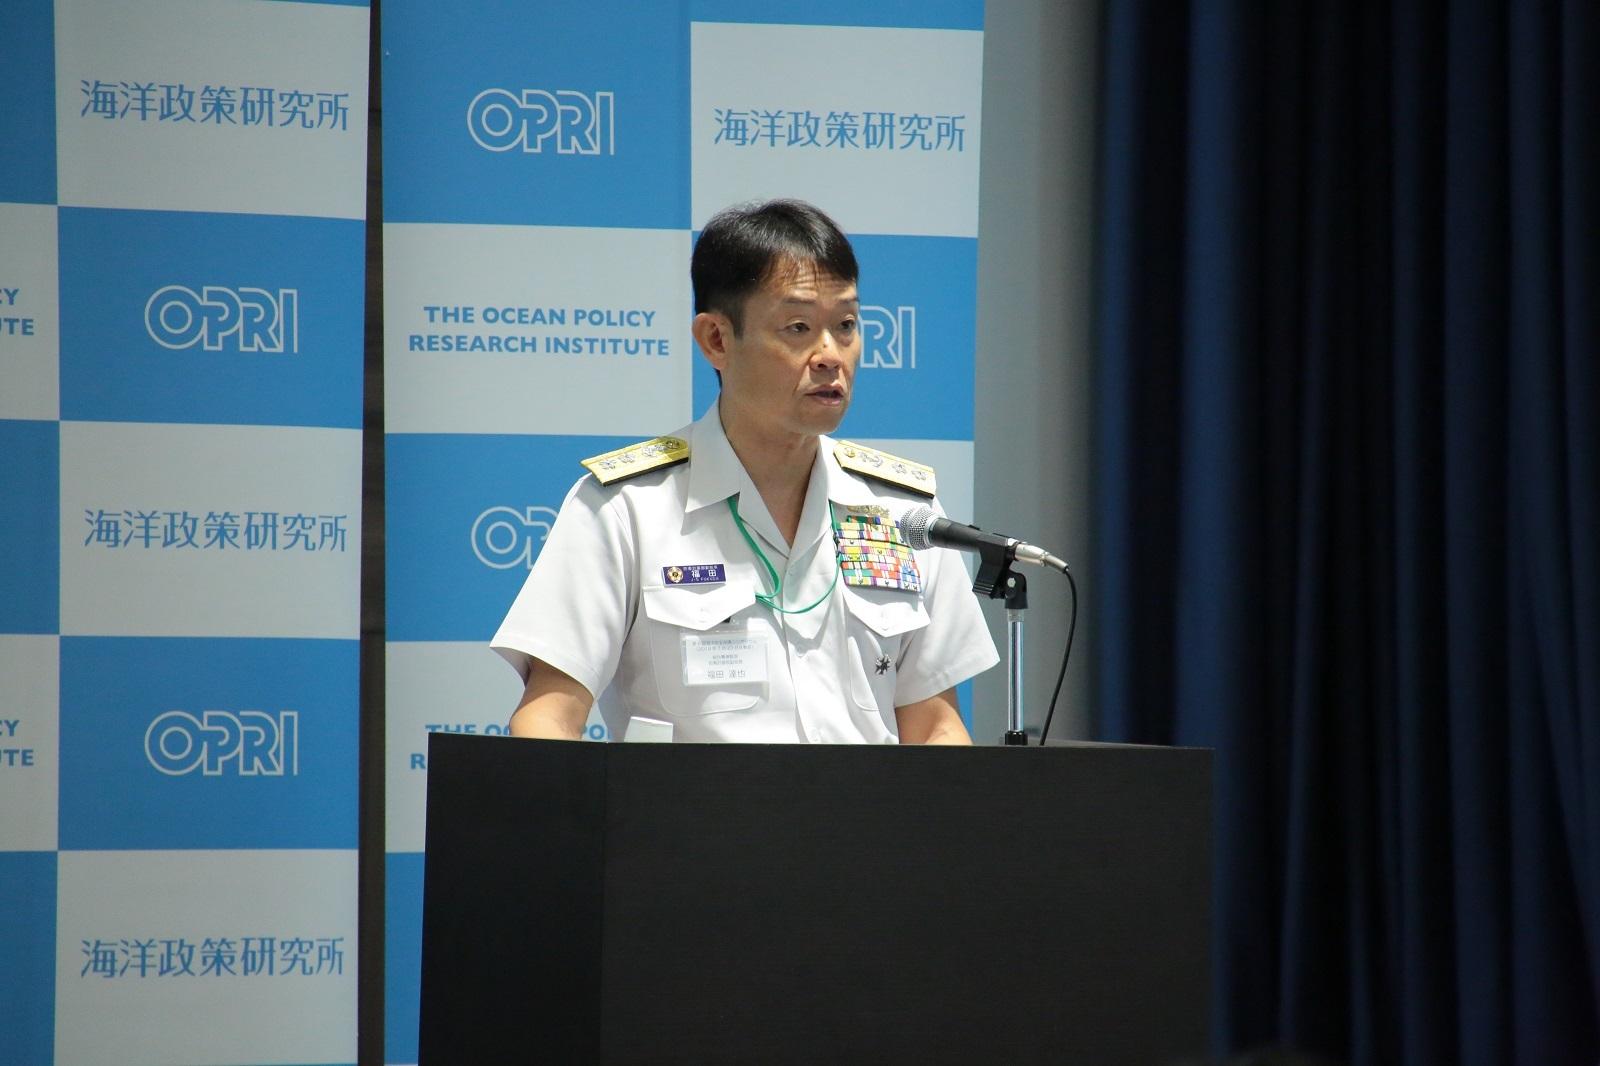 統合幕僚監部防衛計画部副部長の福田達也将補による基調講演